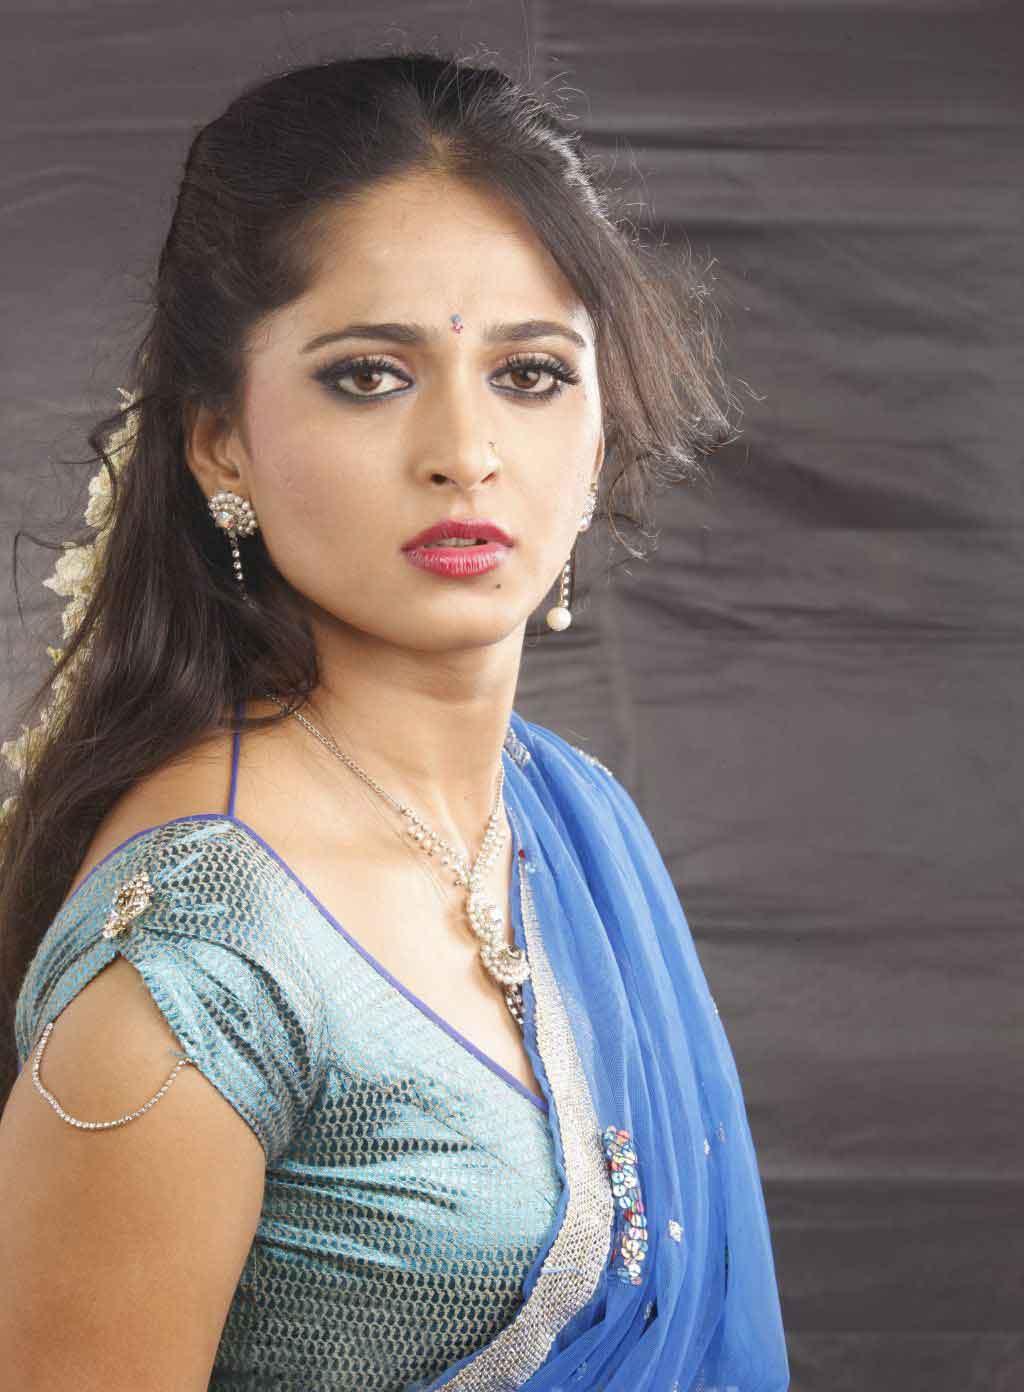 Anushka Shetty Hot Saree Hd Wallpapers Anushka Shetty In Vaanam 1024x1392 Download Hd Wallpaper Wallpapertip